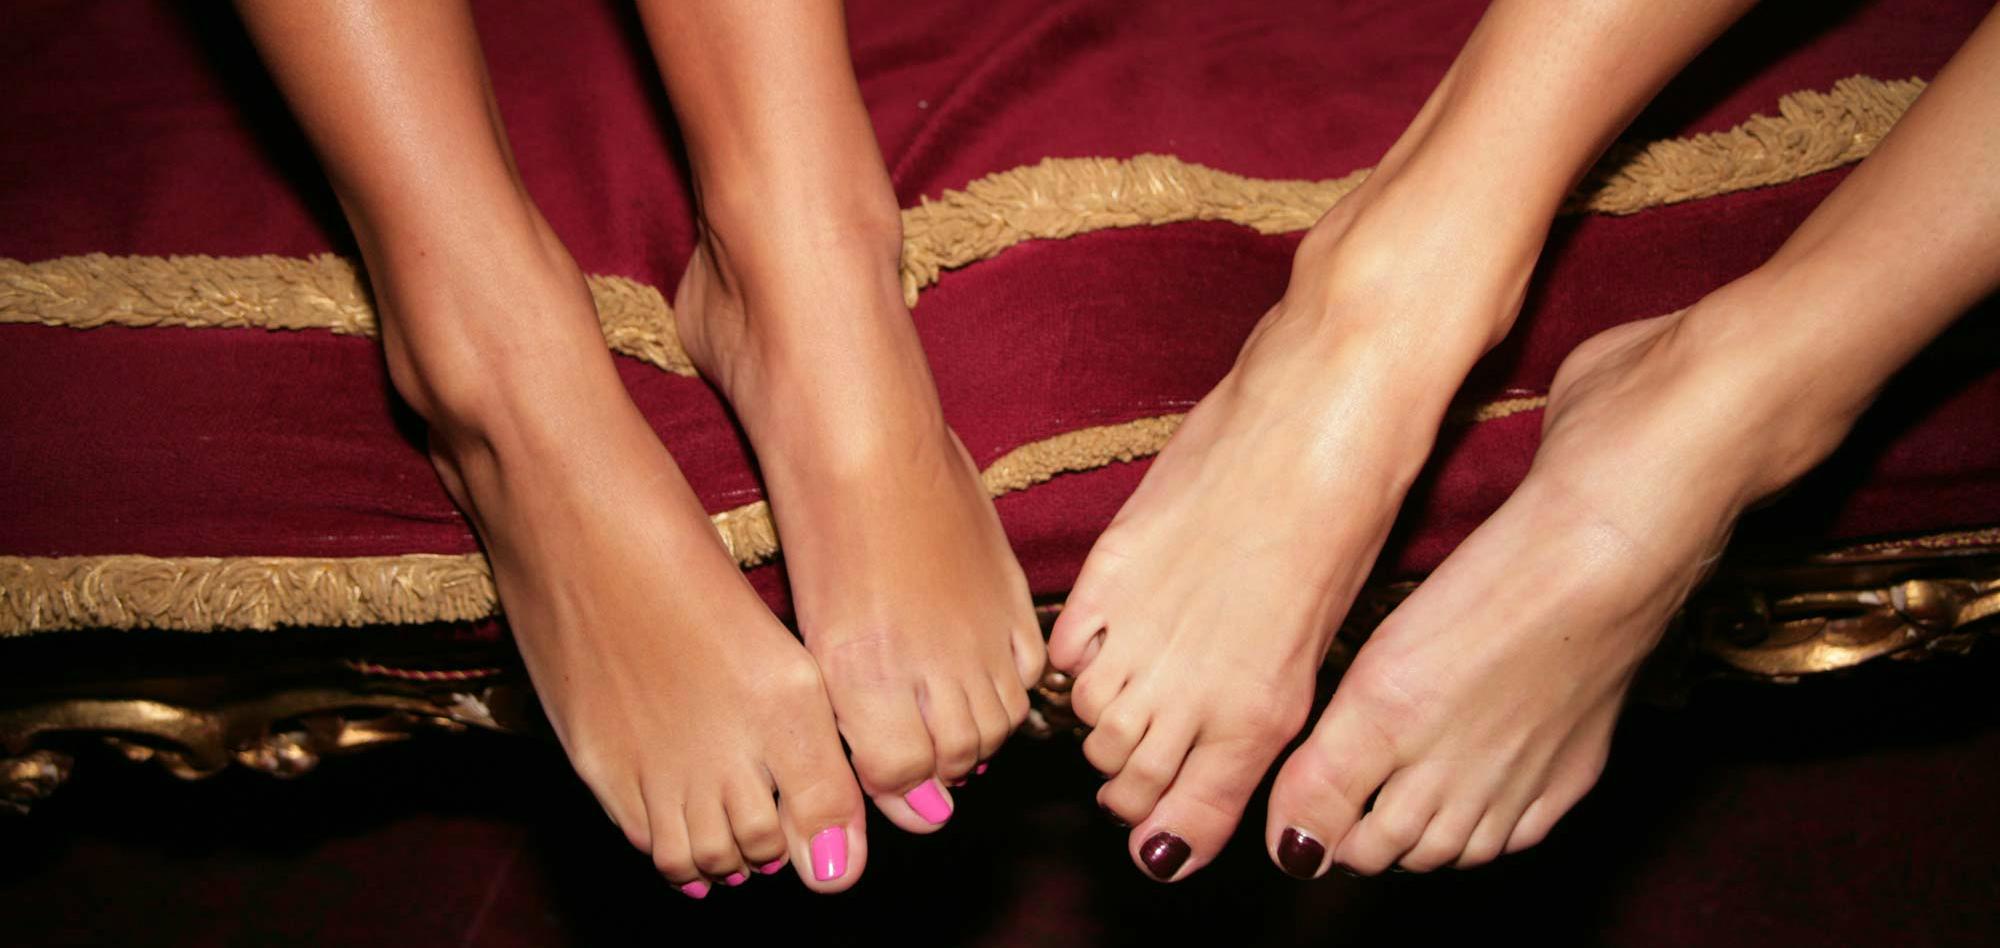 Foot worship and foot fucking with mia lelani 8